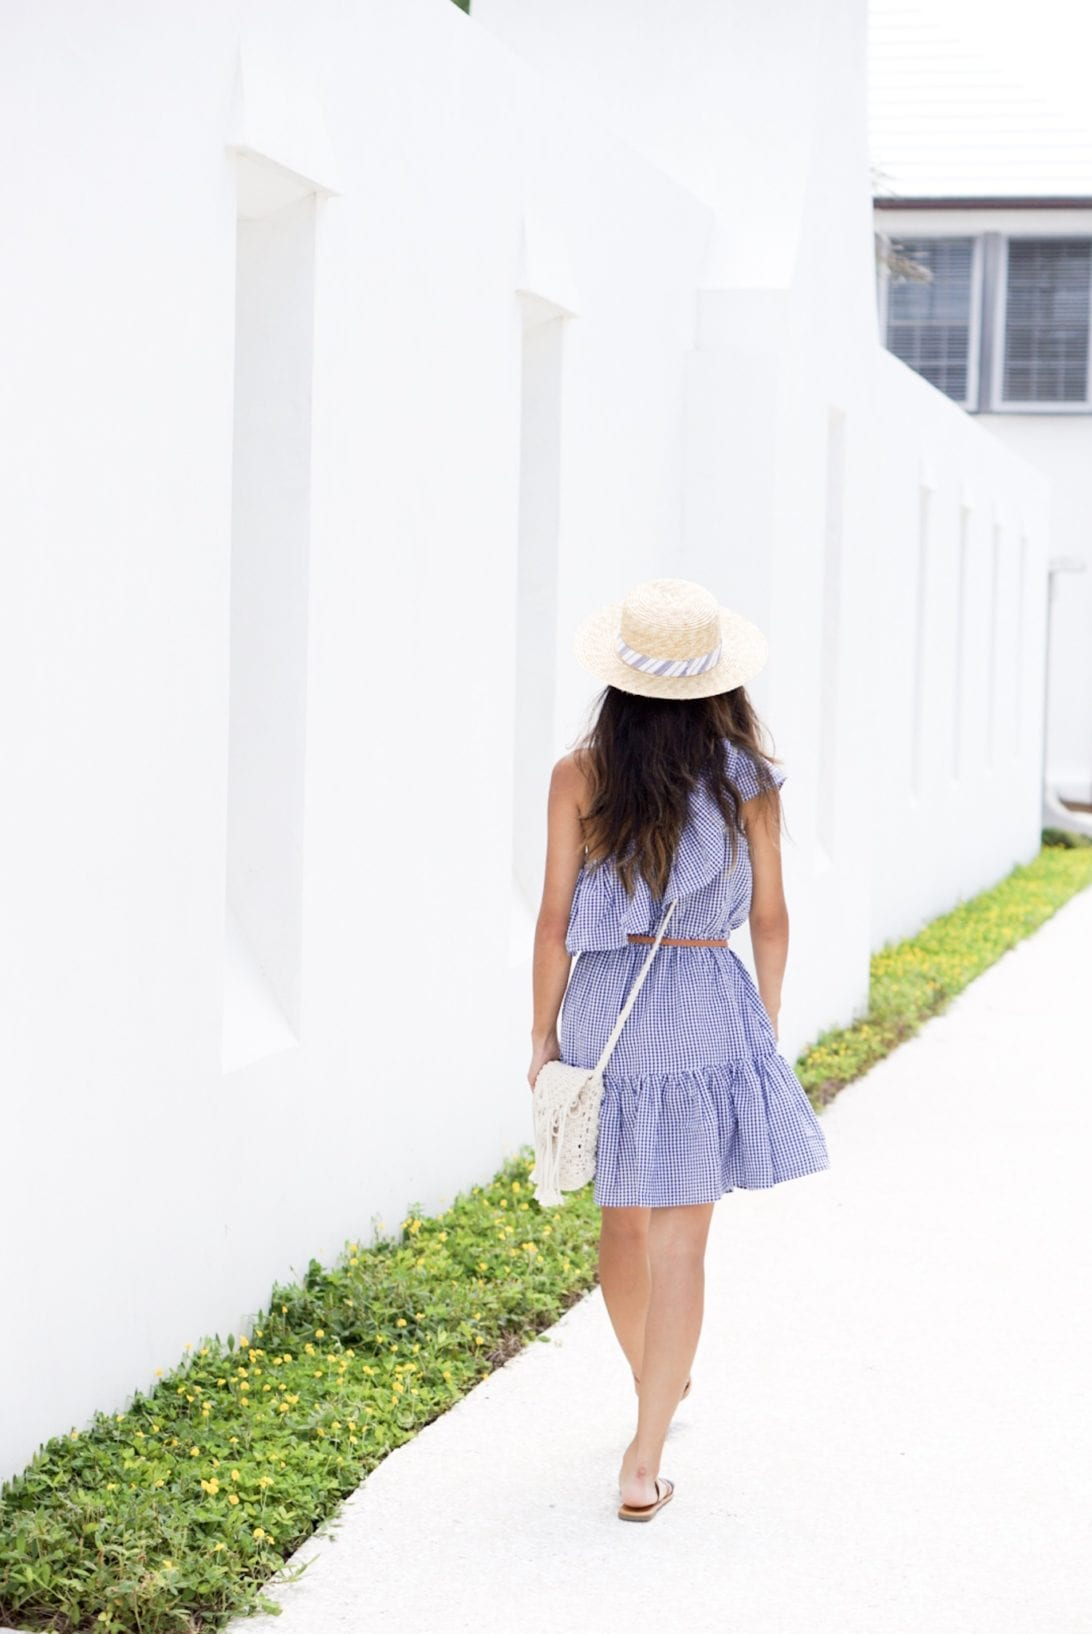 MINKPINK Wanderer One Shoulder Dress in Navy & White, gingham dress, agaci sandals, quay sunglasses, alys beach, Florida, 30a, visit Florida, gingham dress, one shoulder dresses